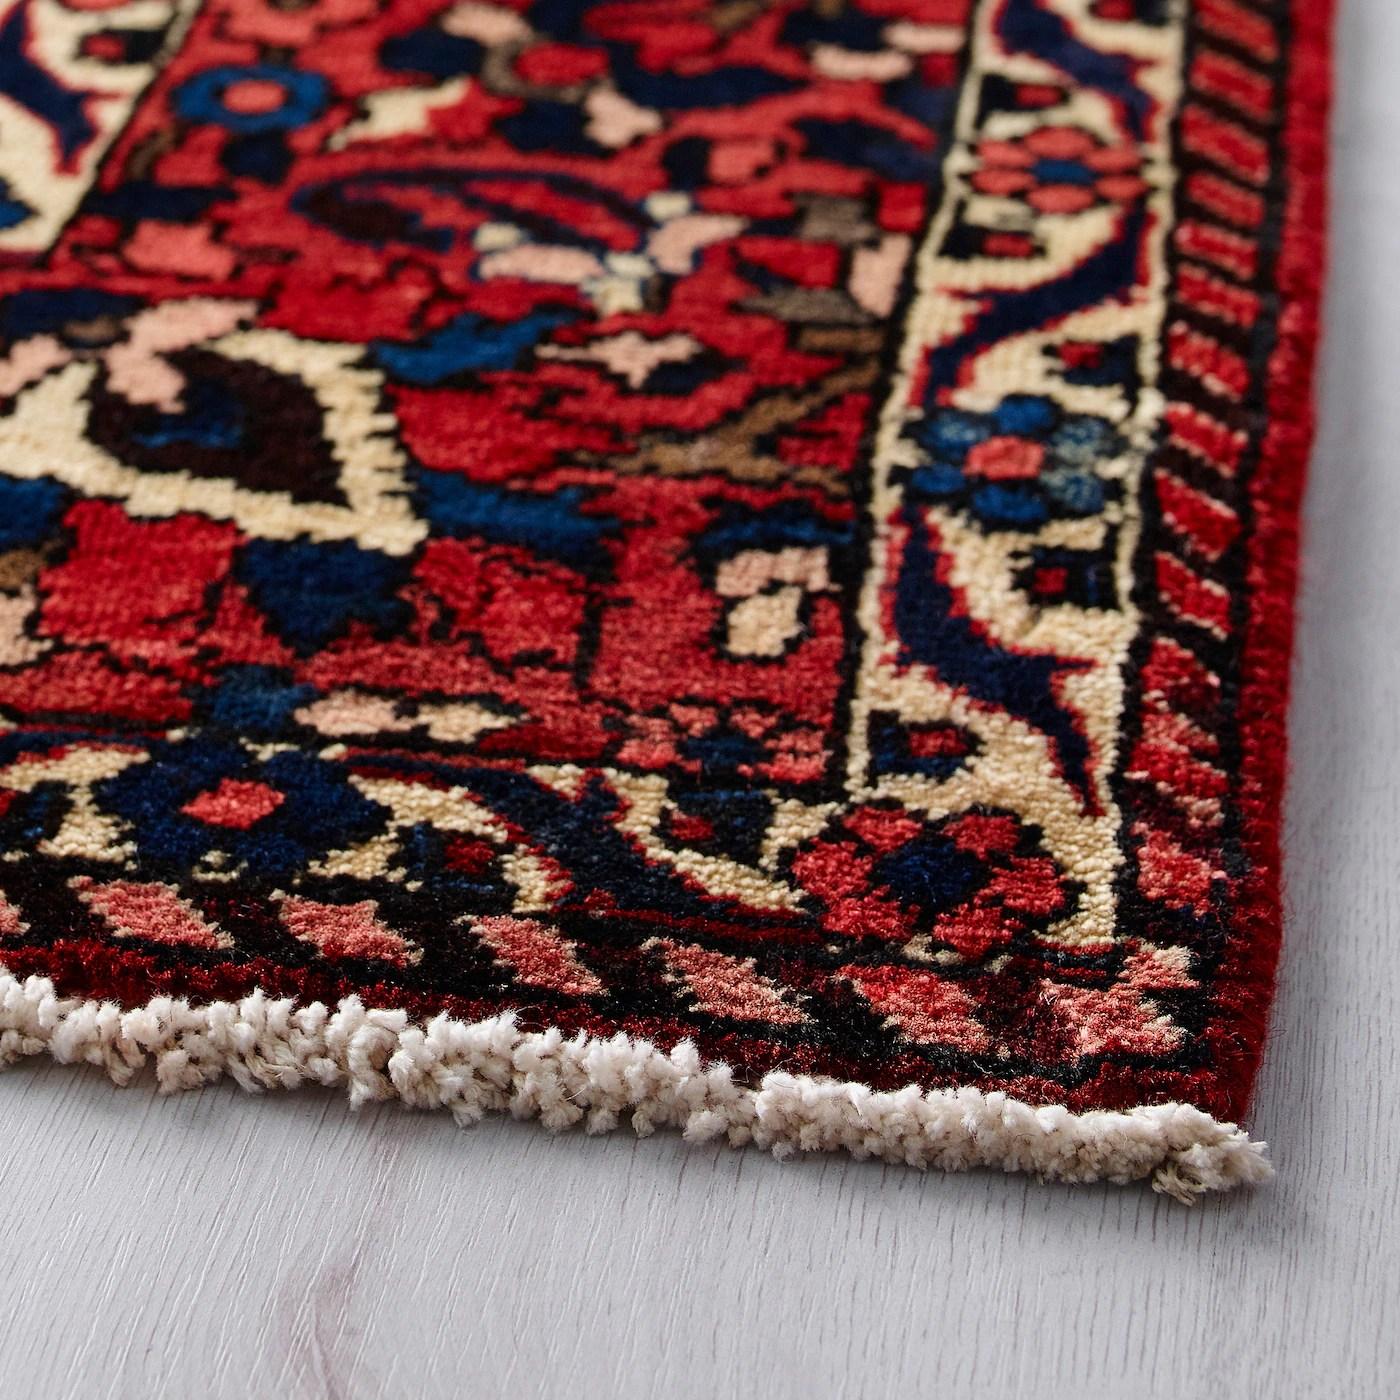 persisk mix tapis poils ras fait main 200x300 cm